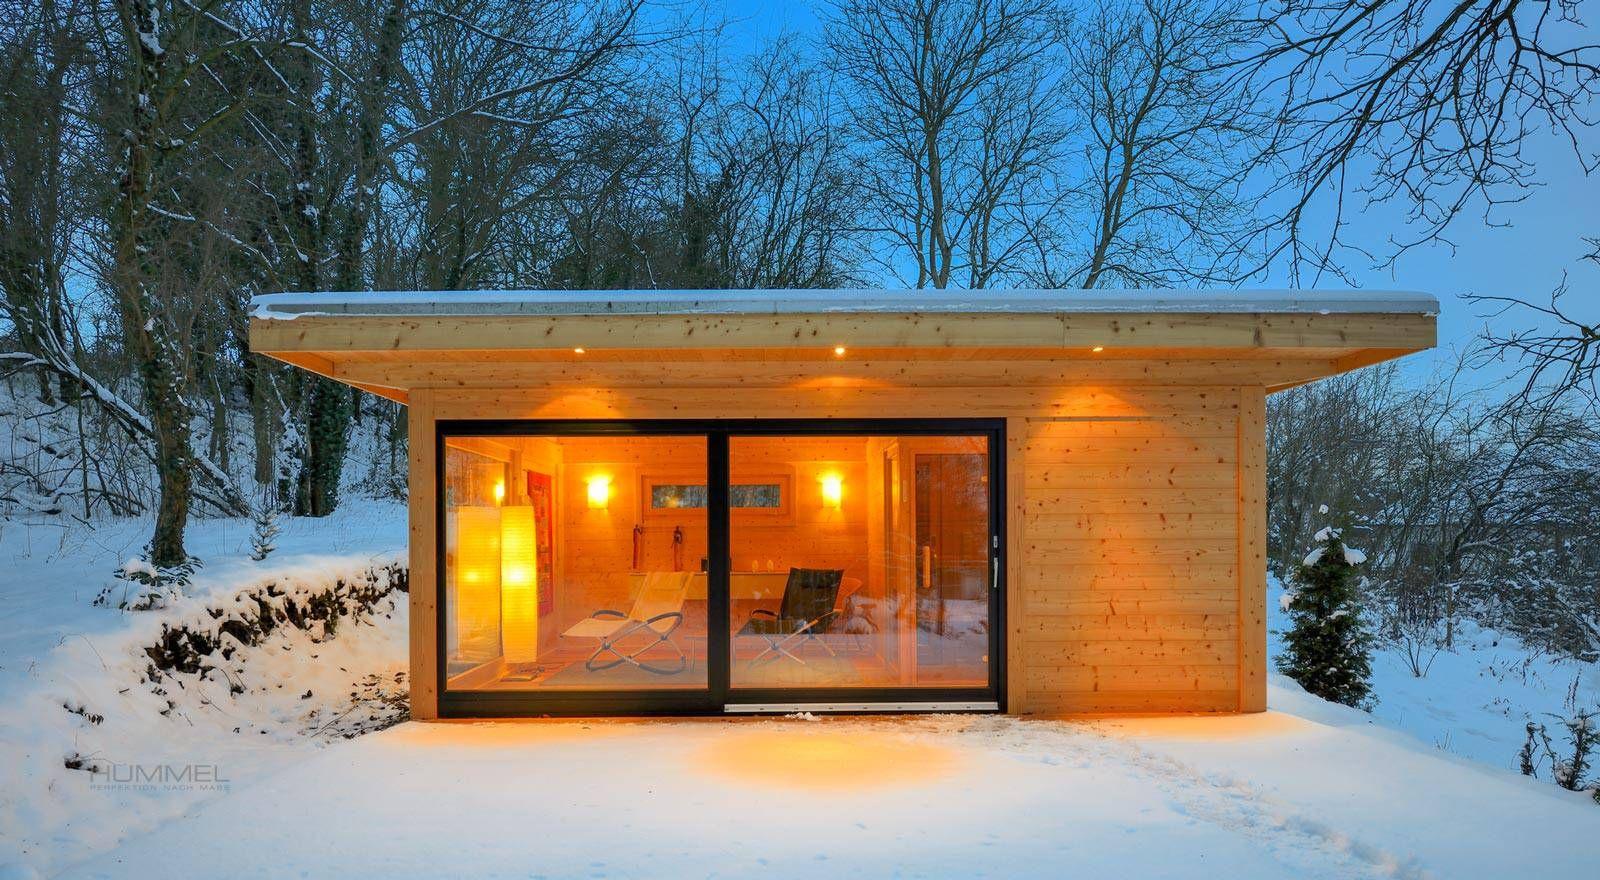 saunahaus kubus sauna pinterest saunas outdoor living and cabin. Black Bedroom Furniture Sets. Home Design Ideas